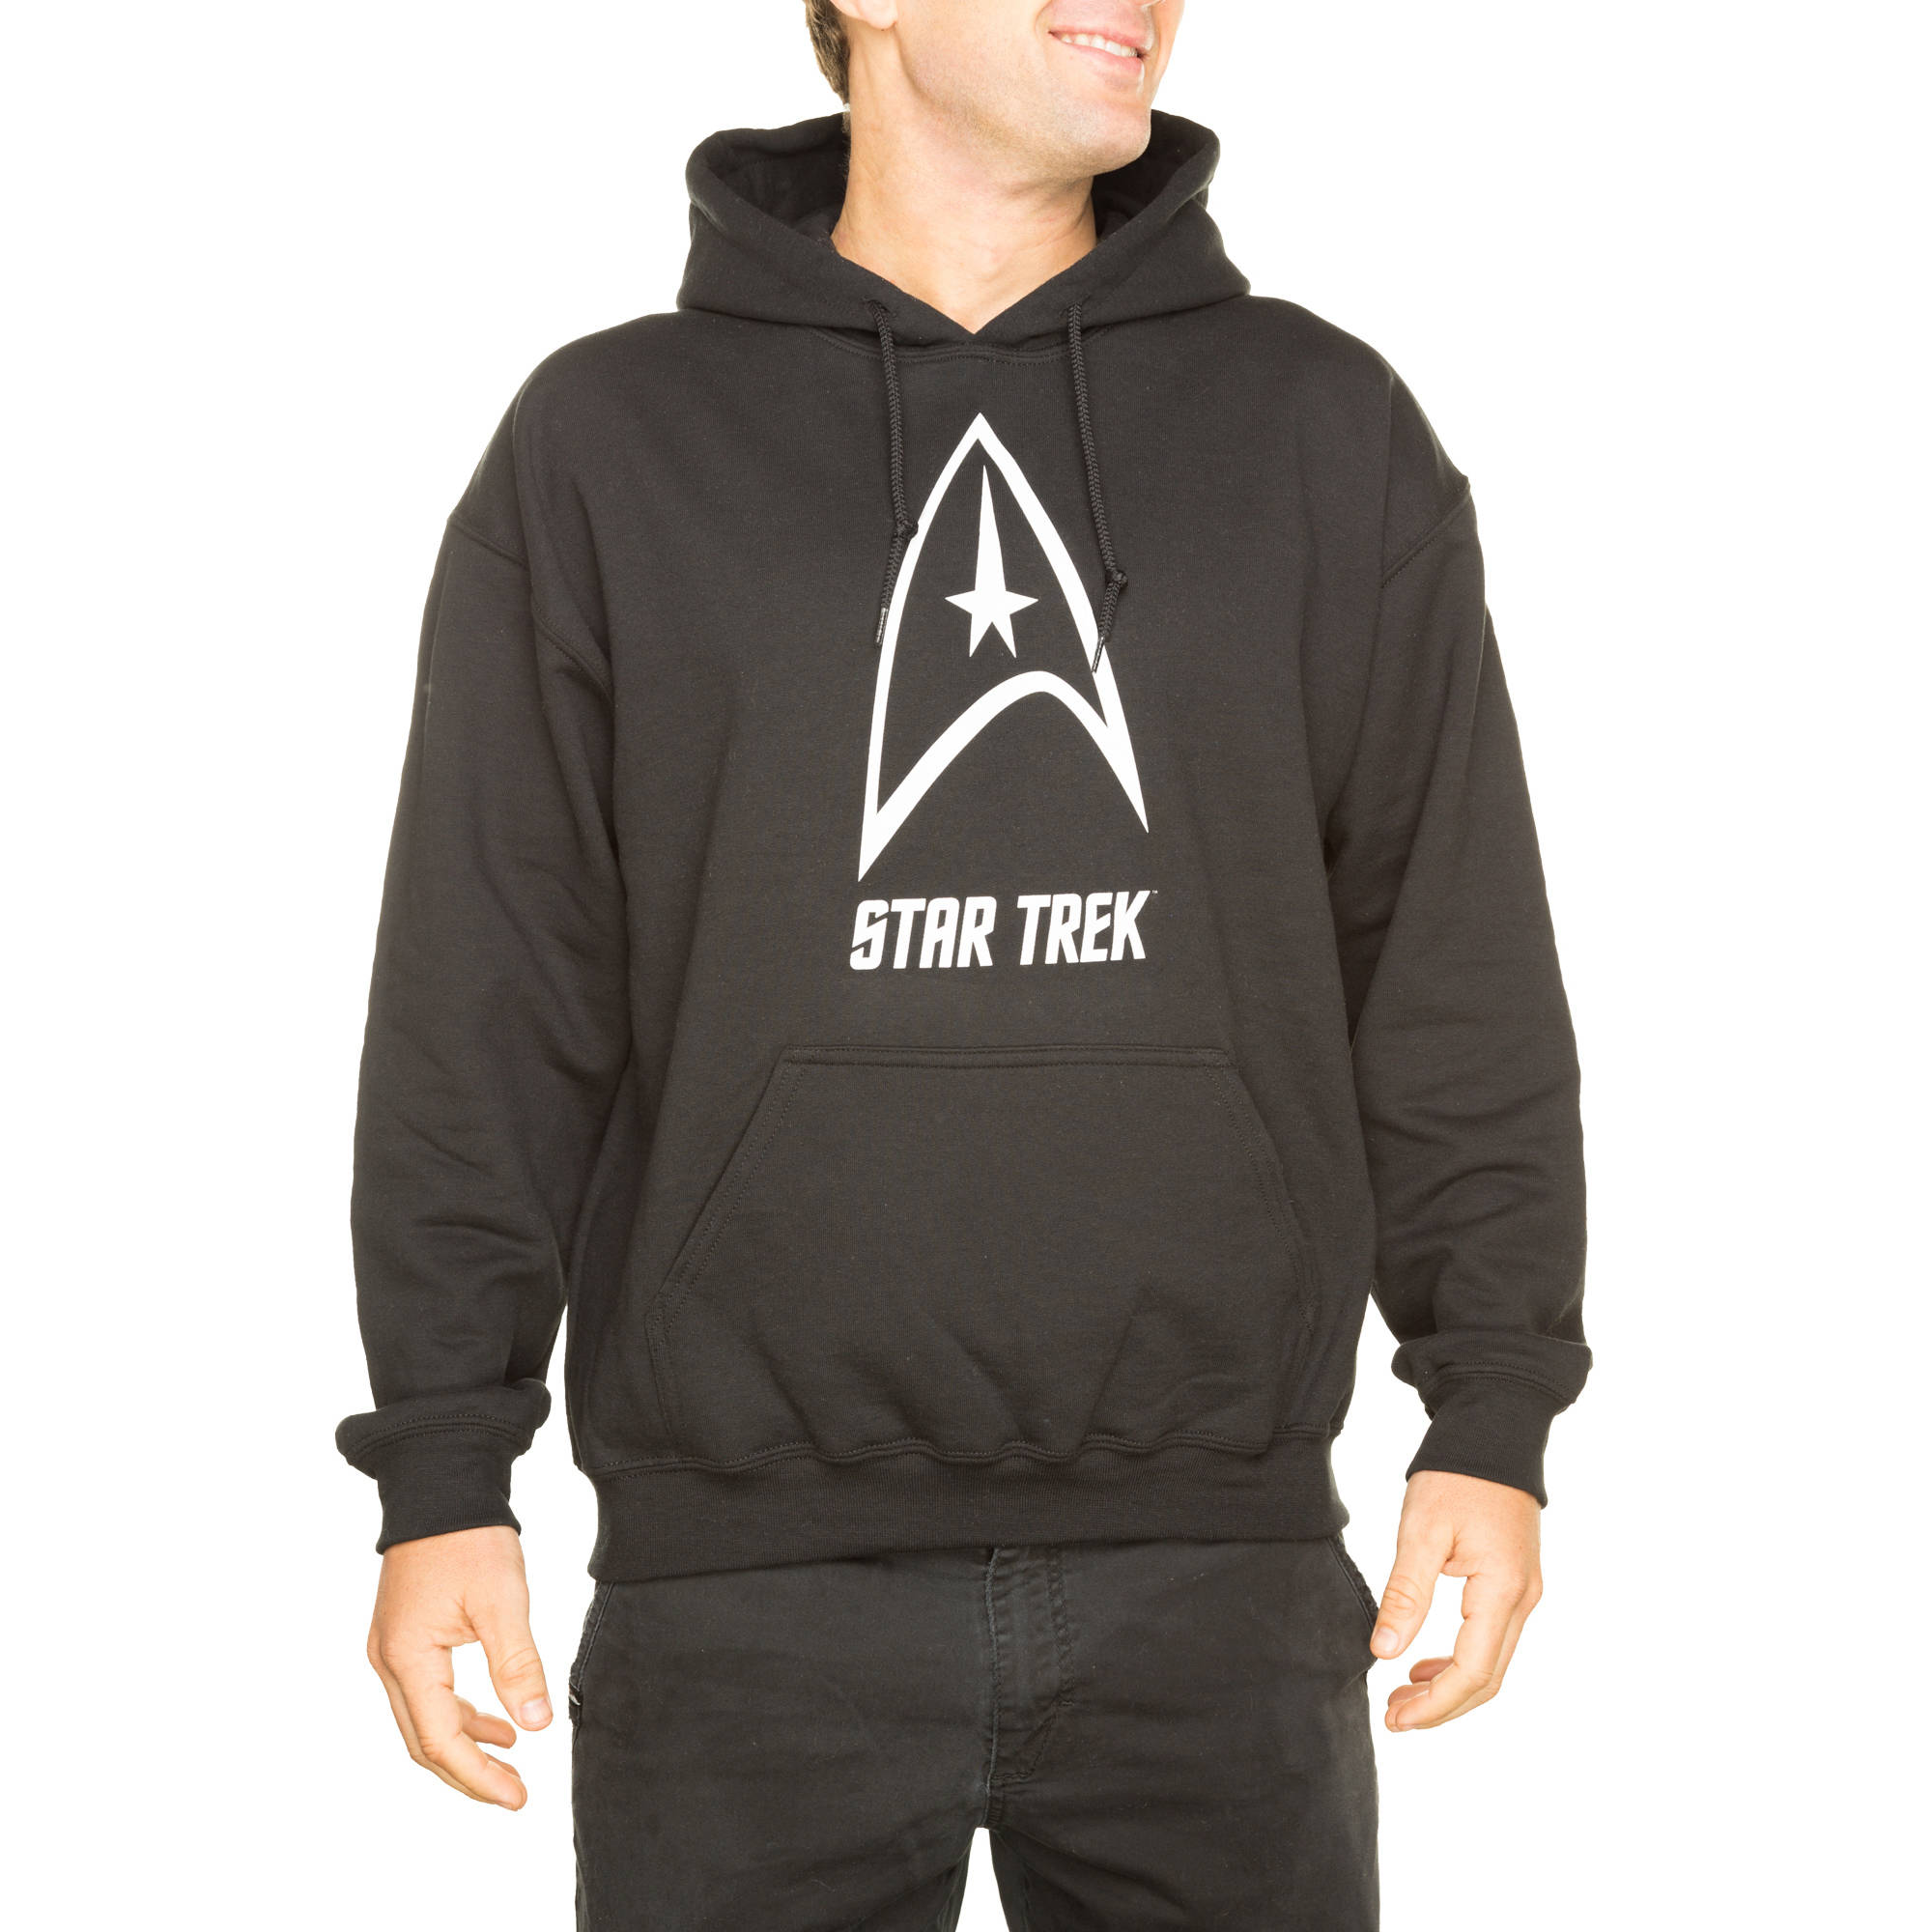 Star Trek Big Men's Delta Shield Pullover Fleece Hoodie, 2XL